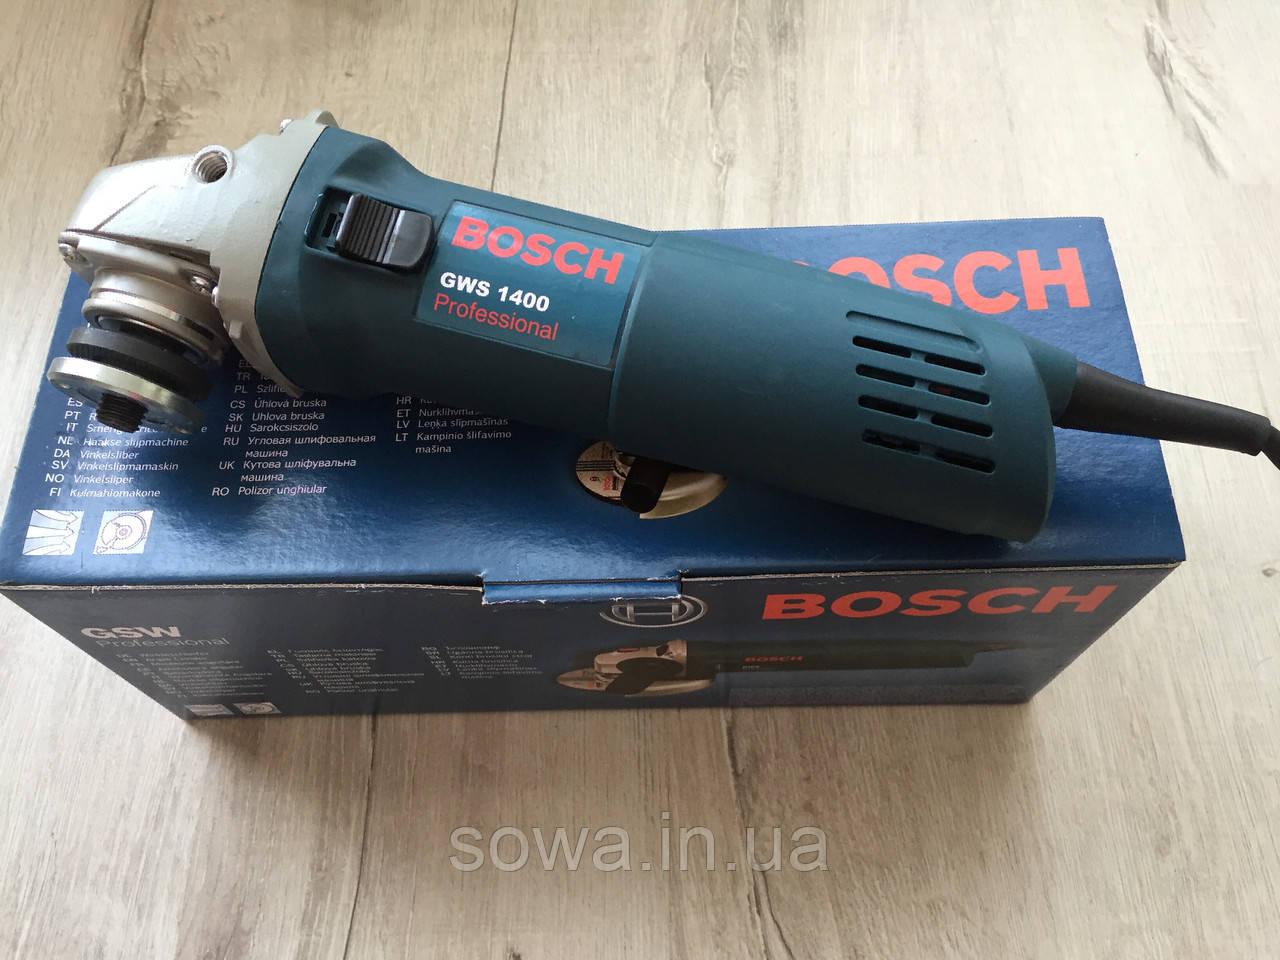 Болгарка BOSCH_ БОШ GWS1400 ( 1400 Вт, 125 мм ) + ПОДАРОК - фото 8